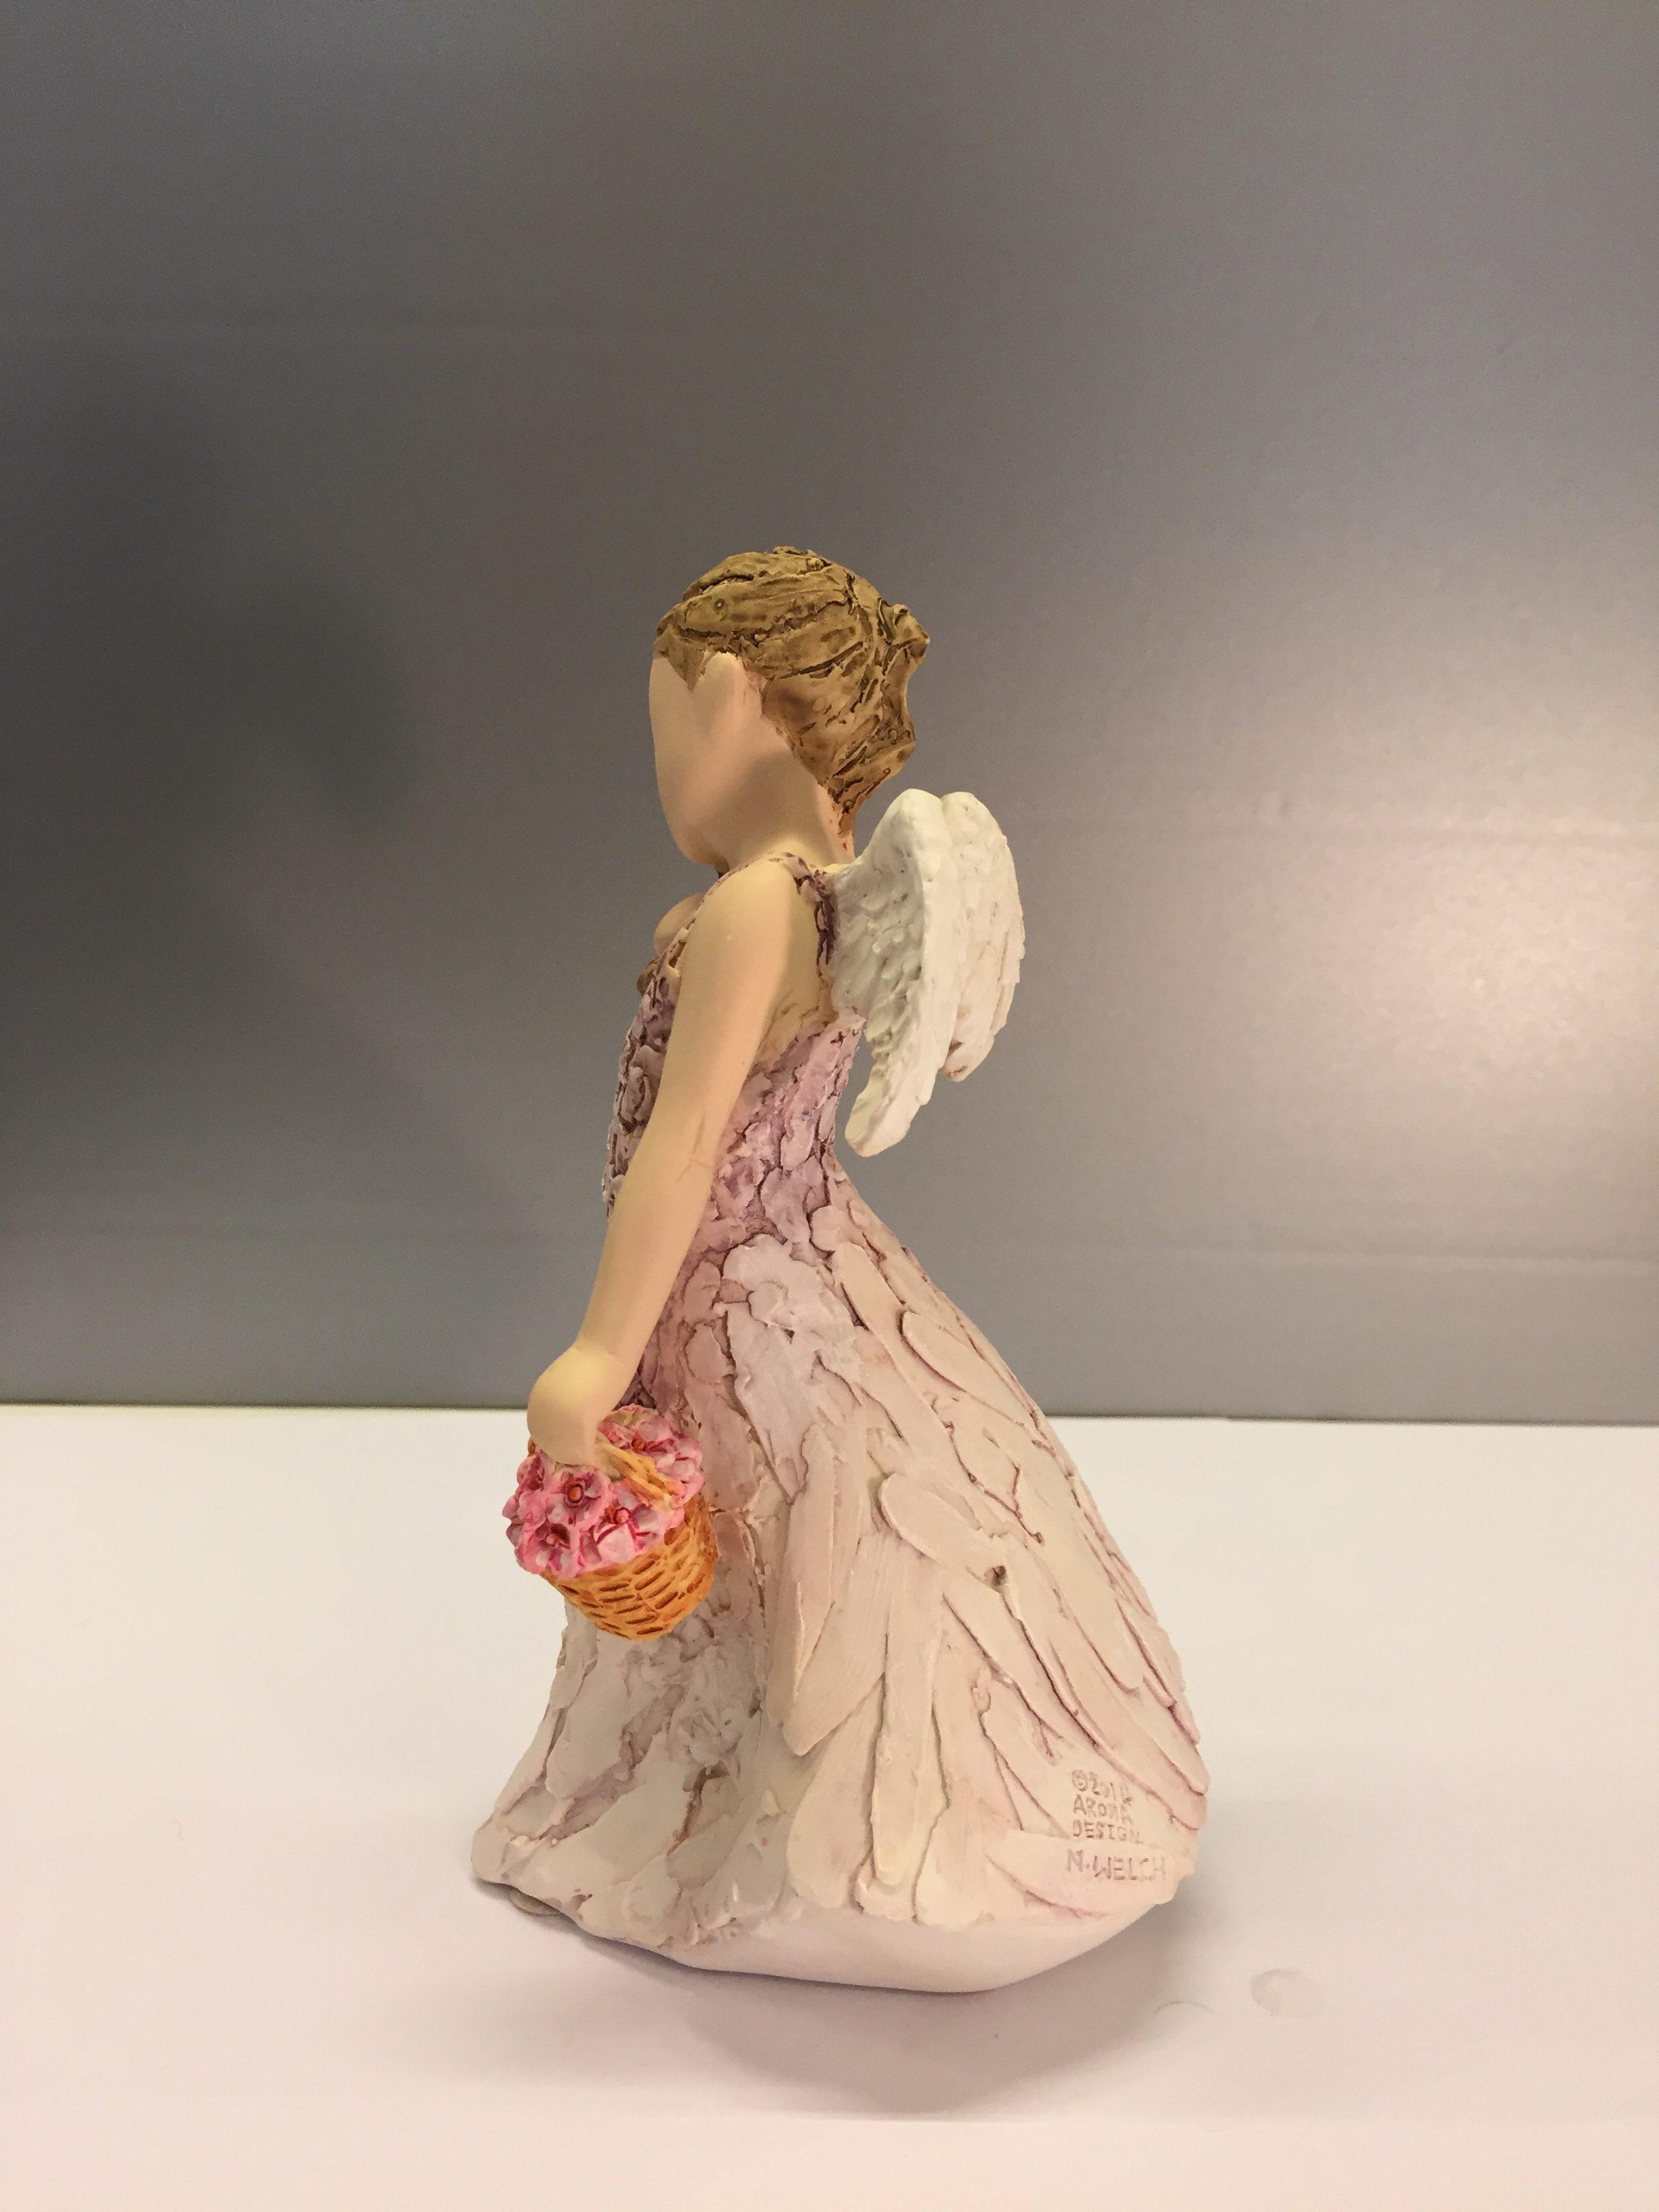 "Arora ""More than words"" - Lille engel med blomsterkurv - Friends are angels"